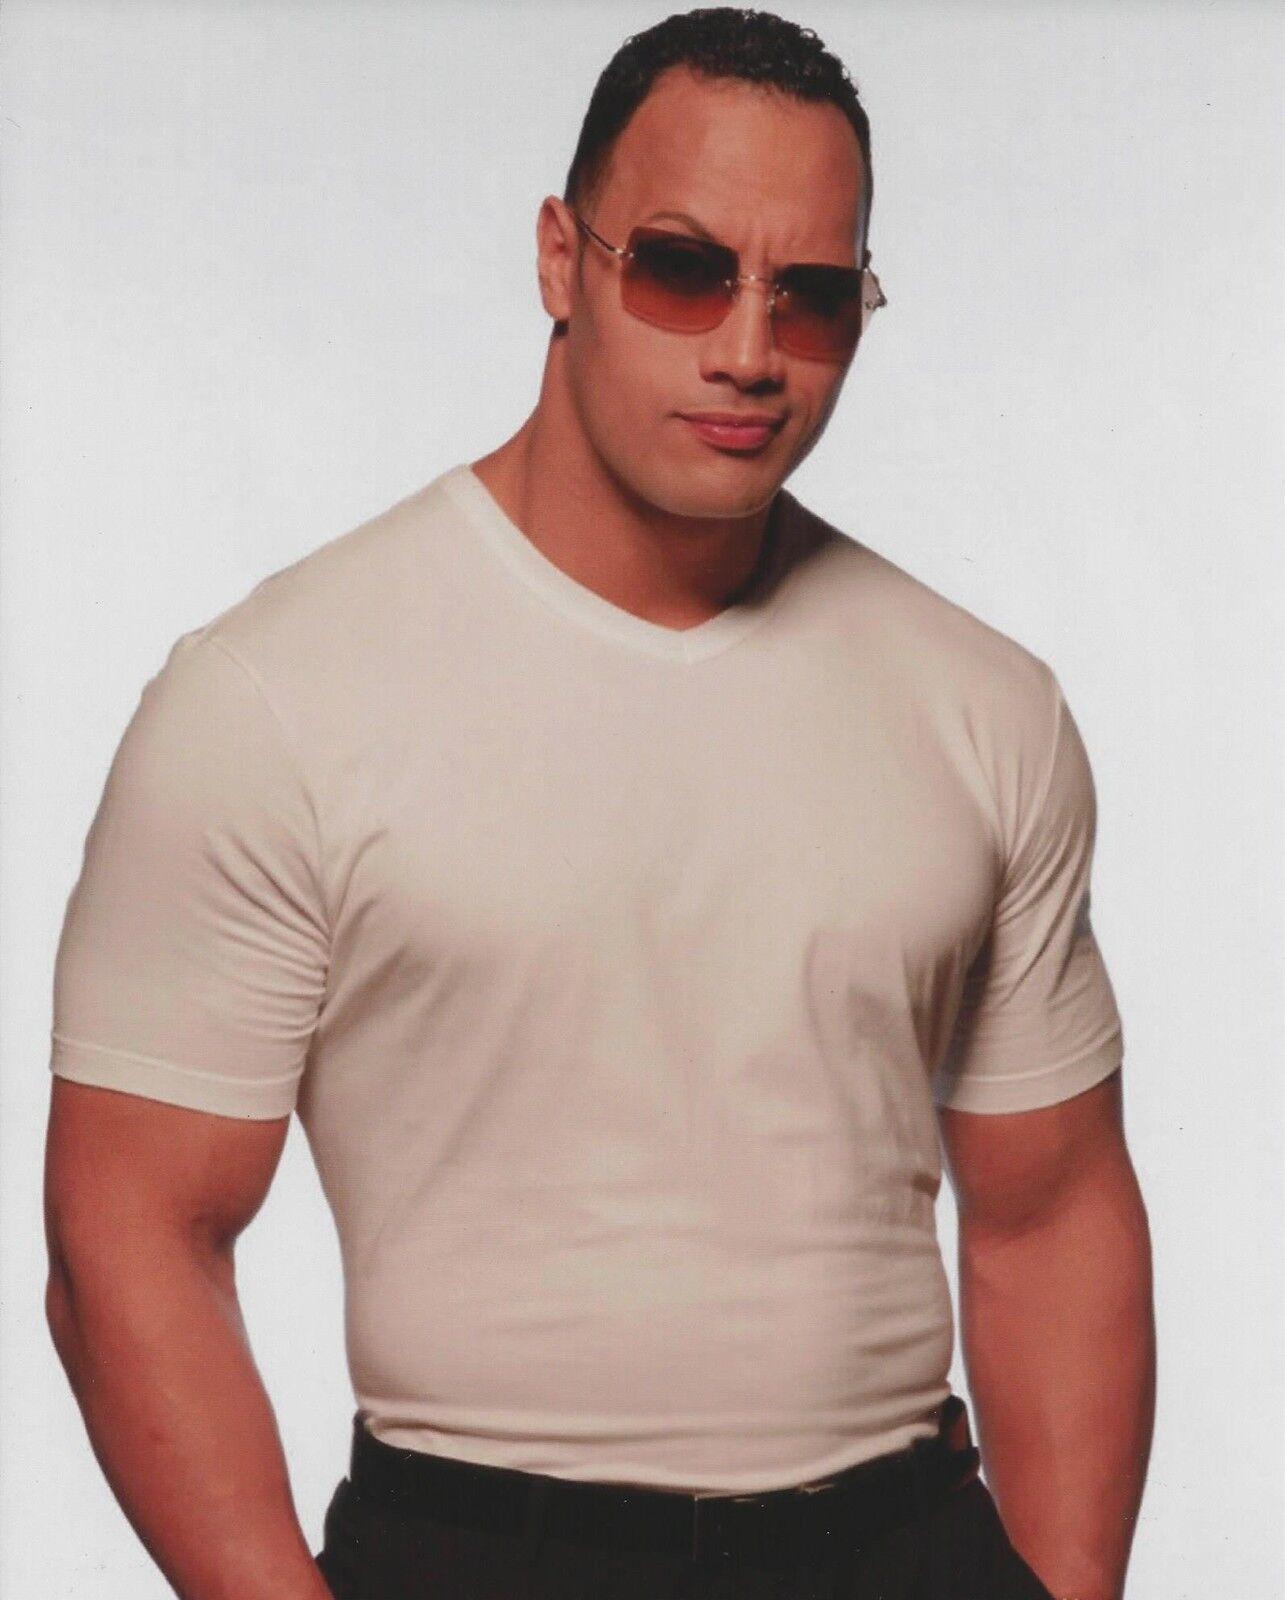 Dwayne Johnson The Rock Unnsigned 8X10 Photo